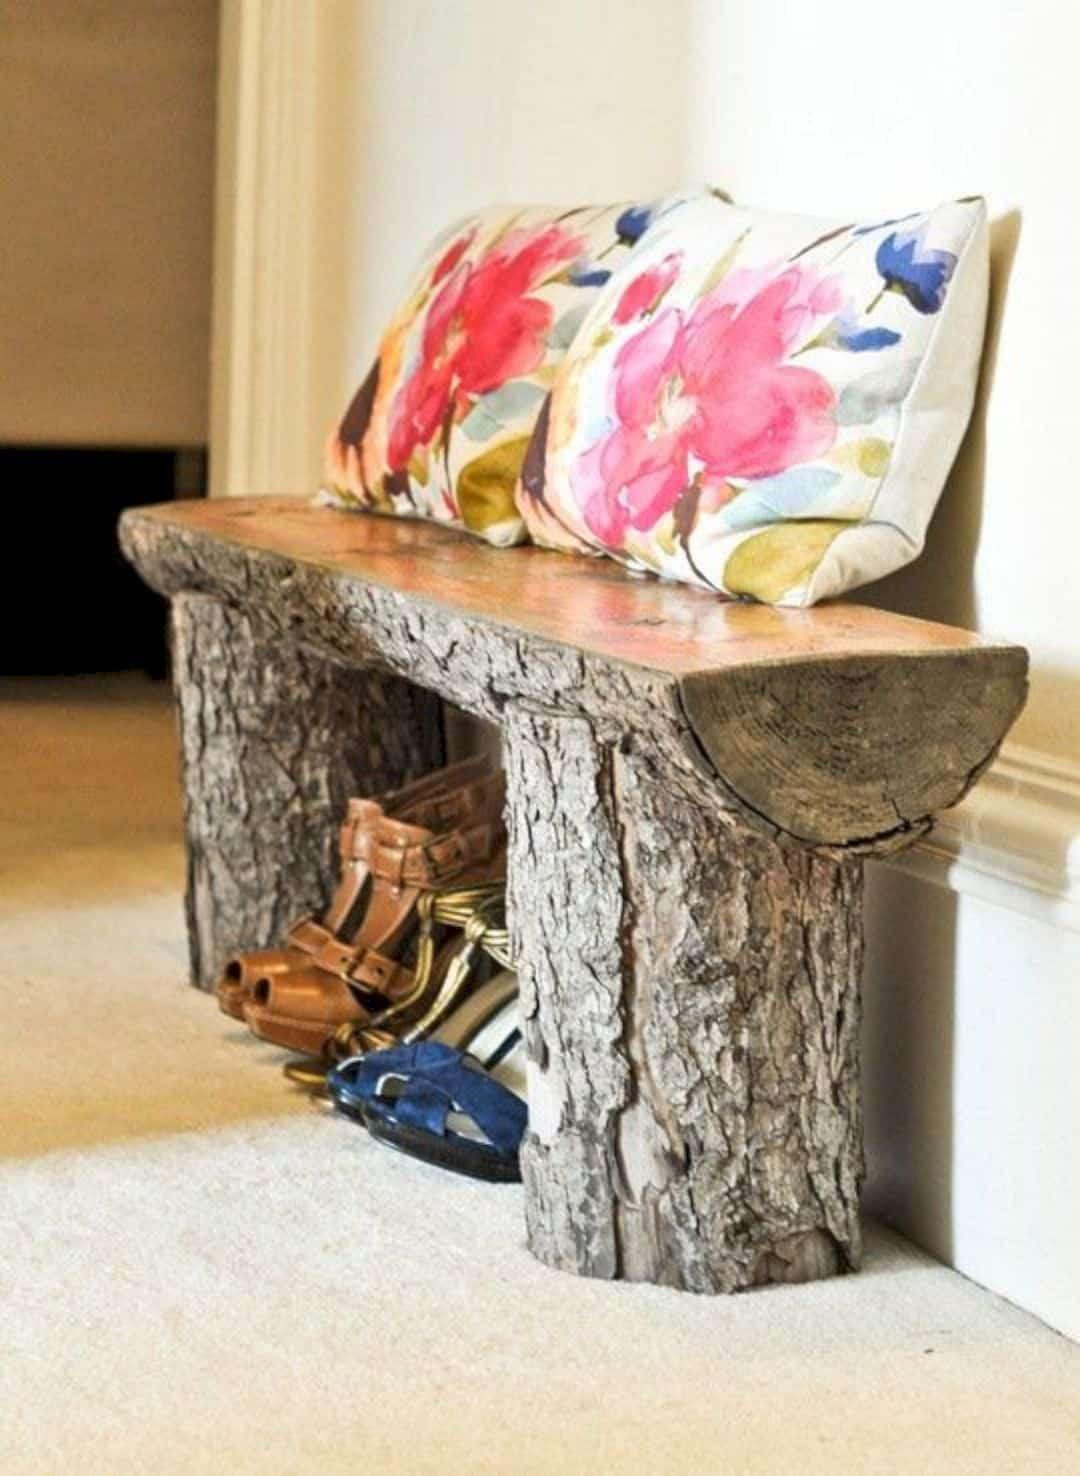 A log bench